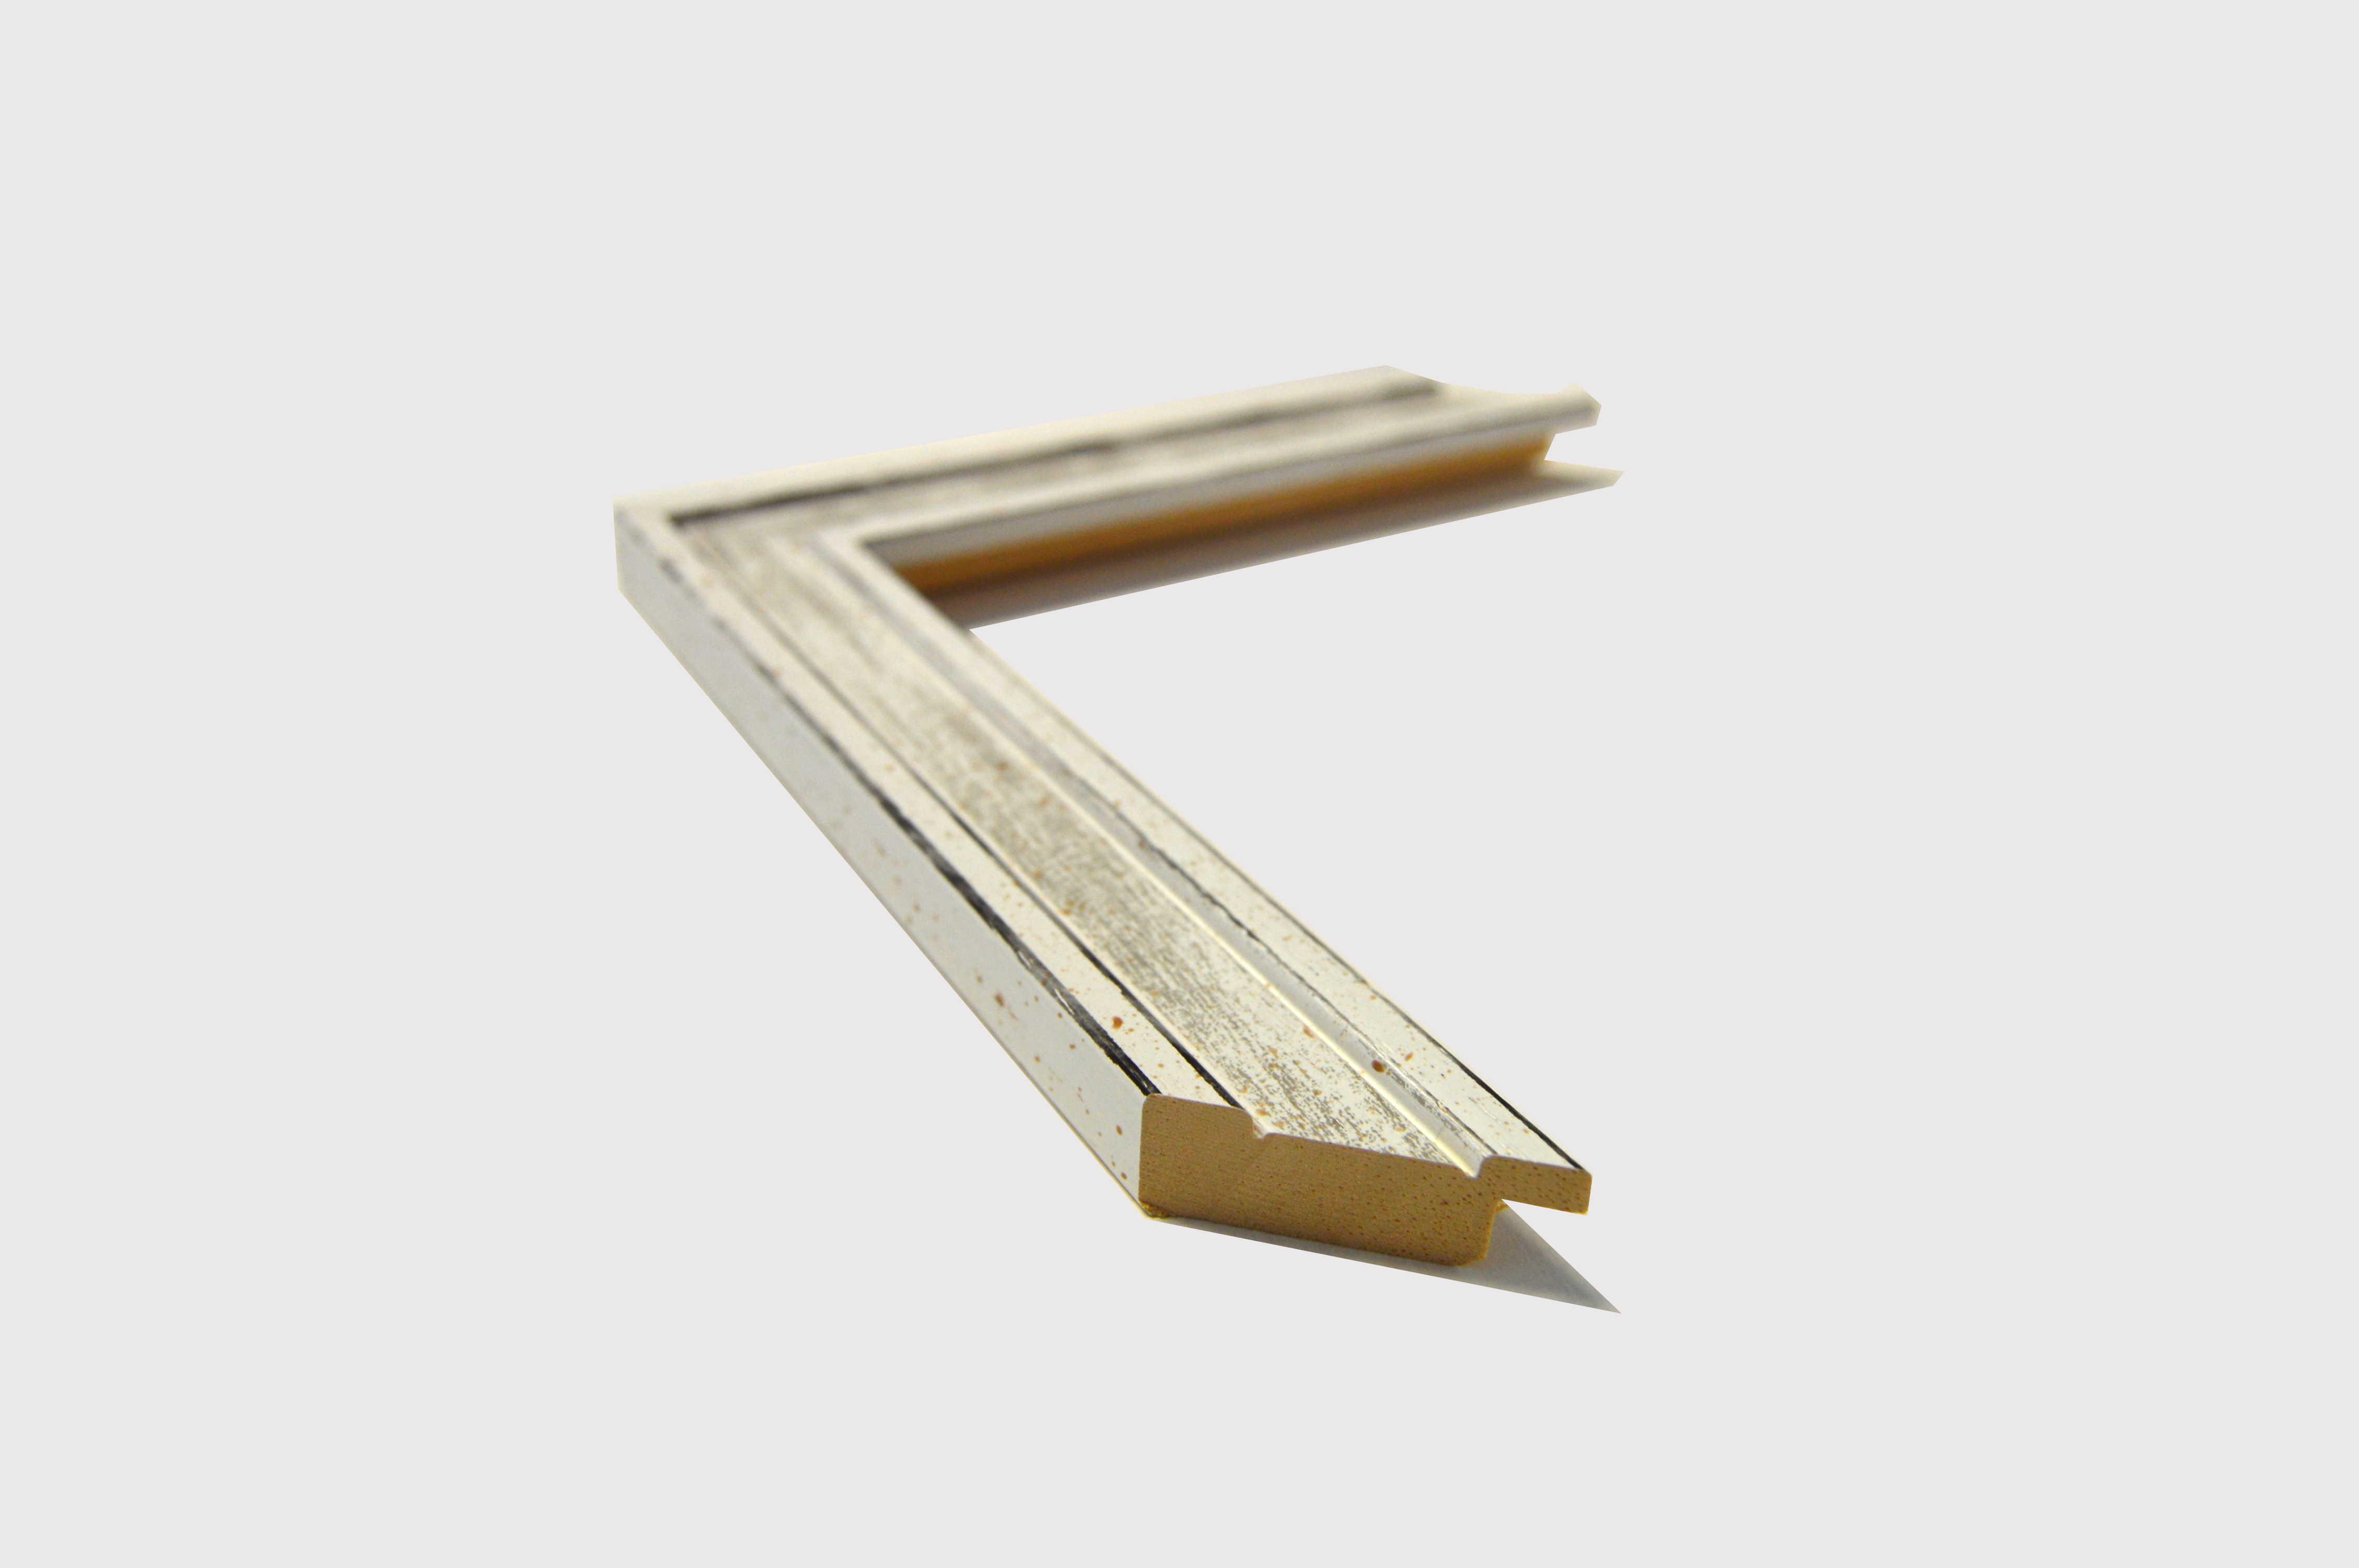 02165-PLATA-ancho3cm-perfil